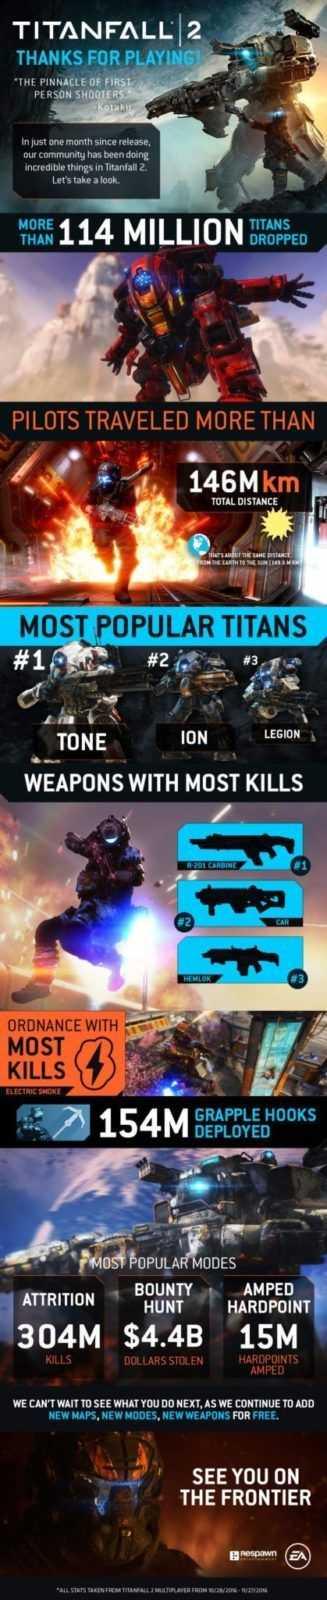 titanfall-2-info